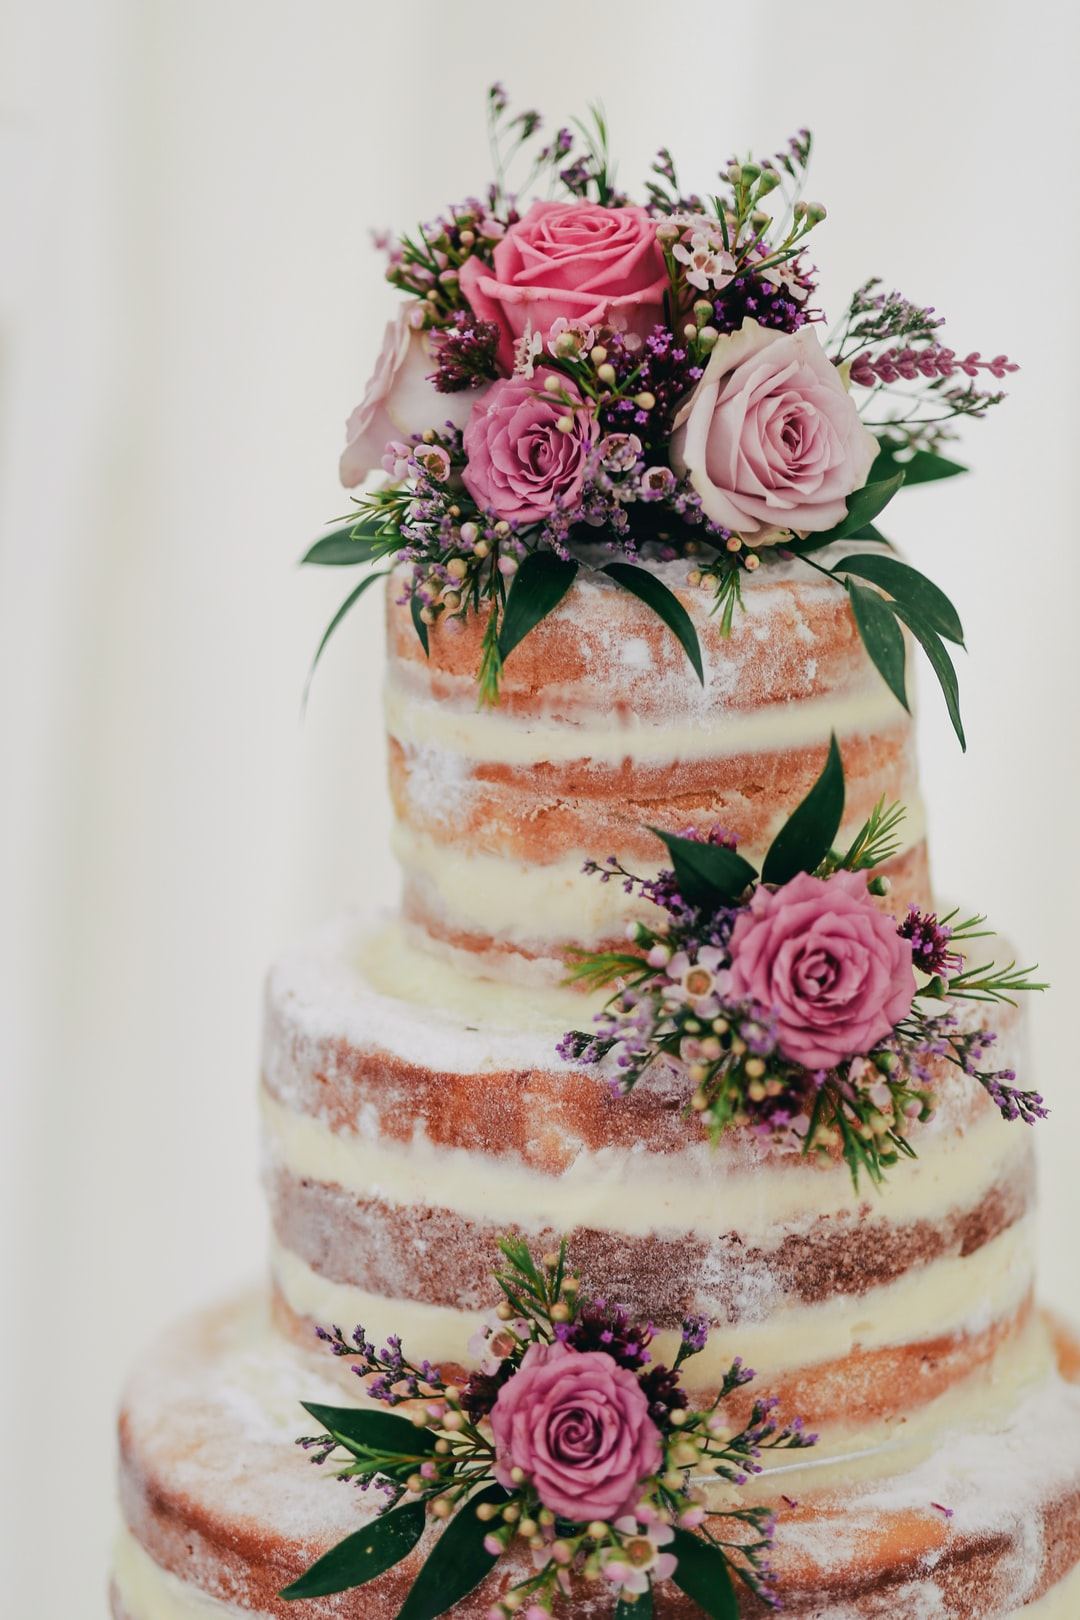 100 Birthday Cake Pictures